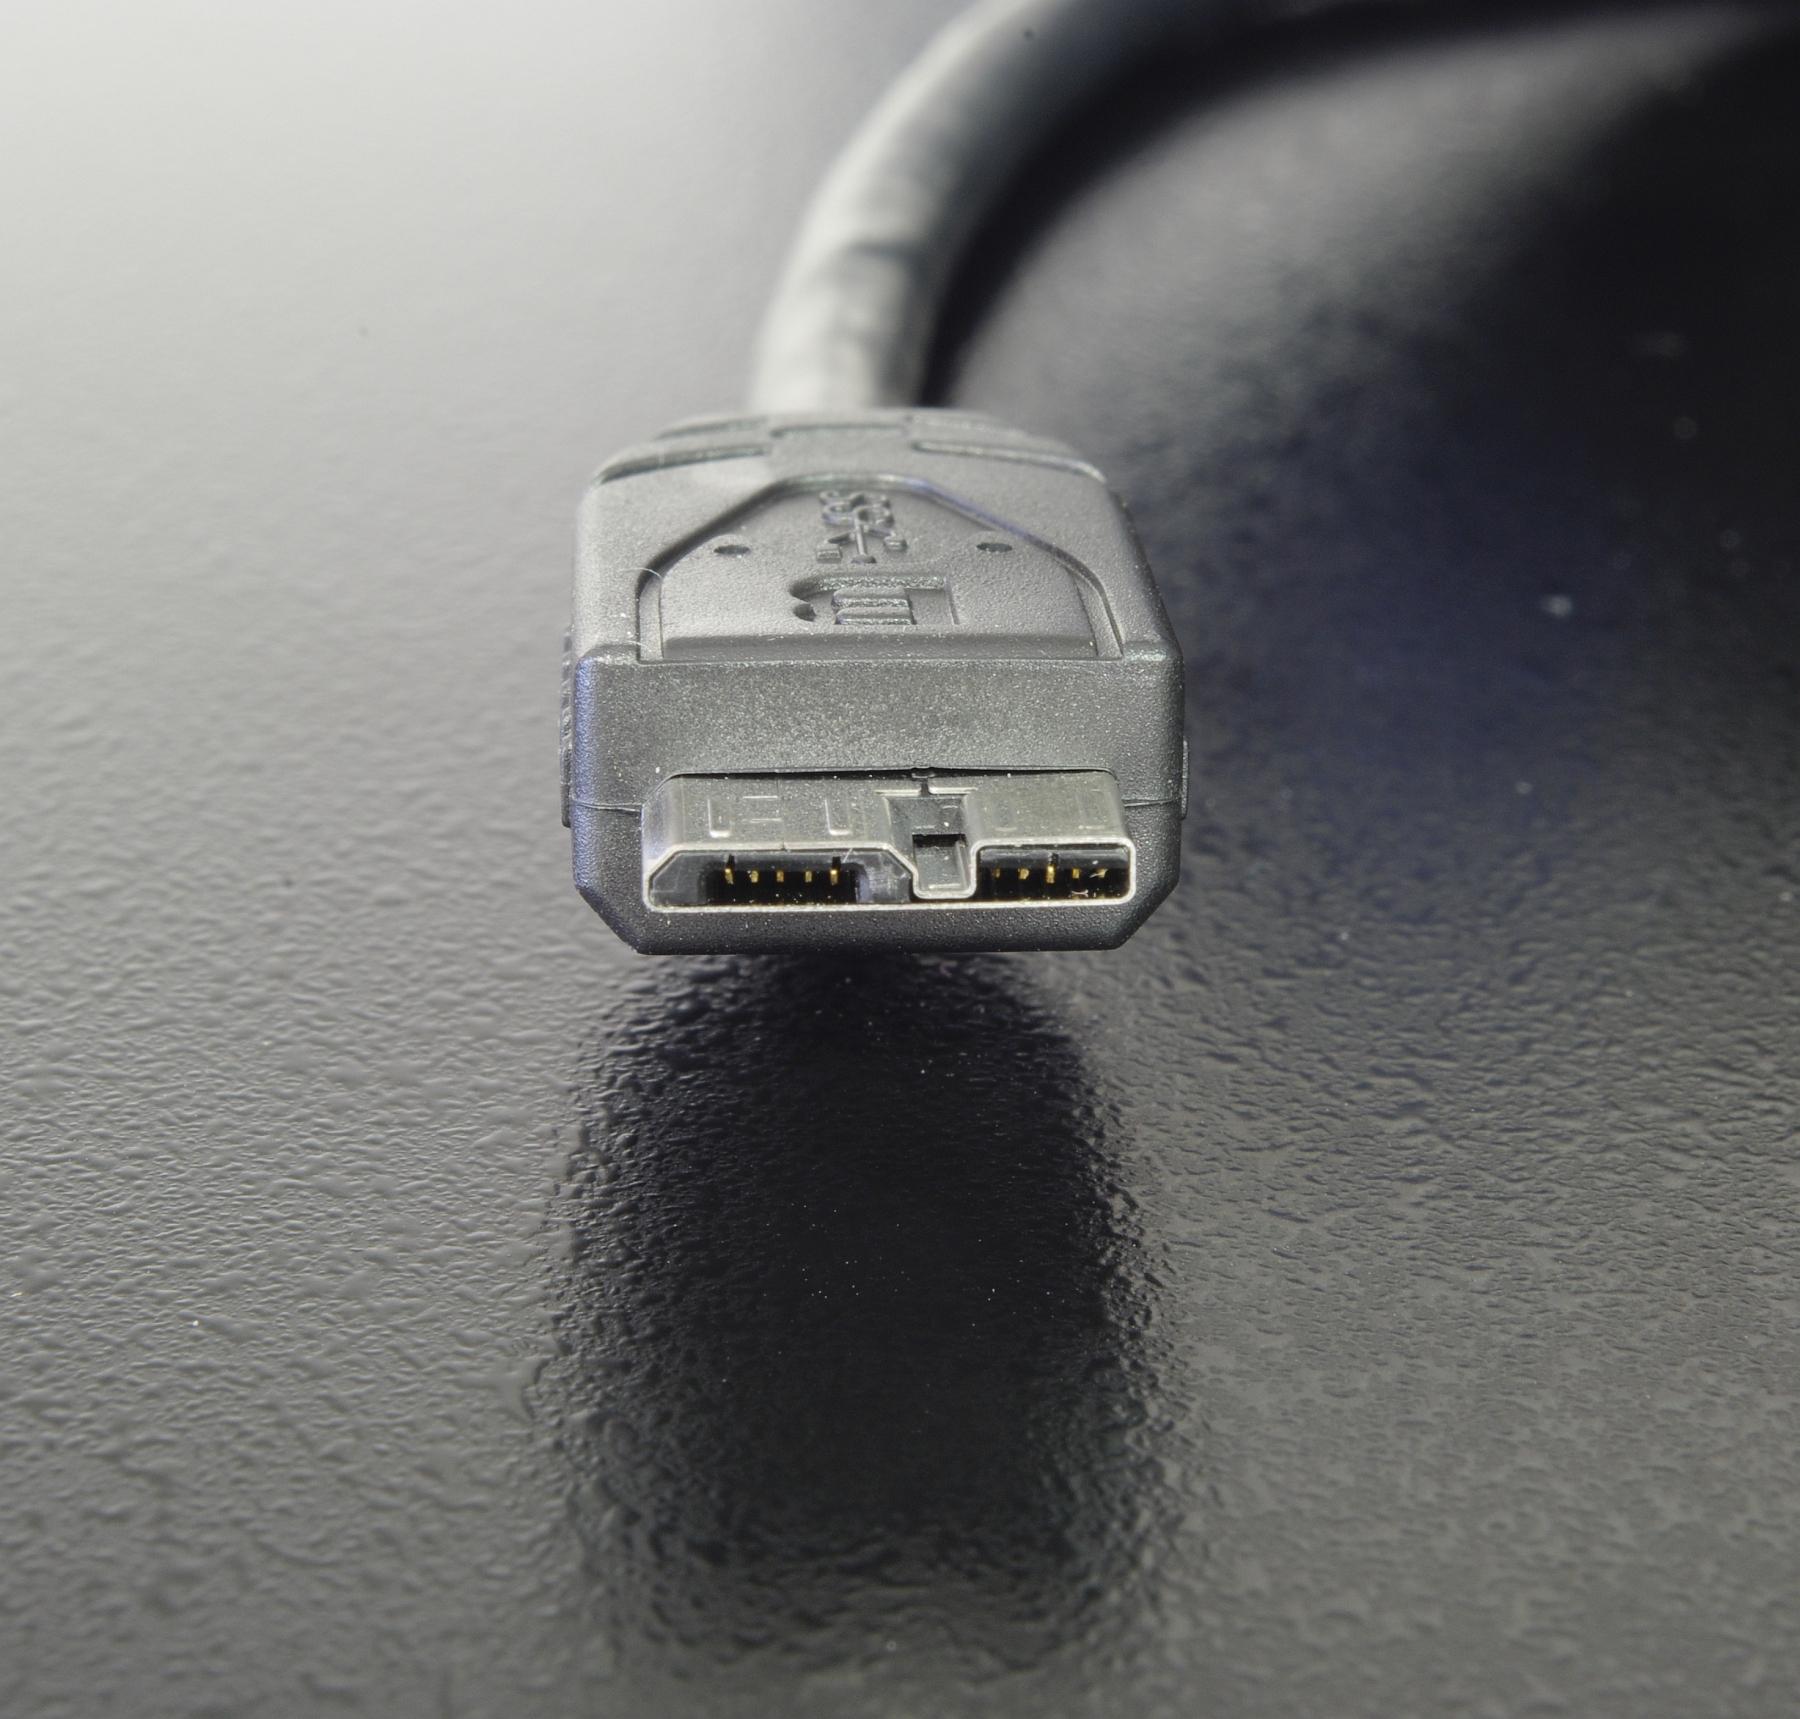 Connector USB 3 IMGP6028 wp.jpg